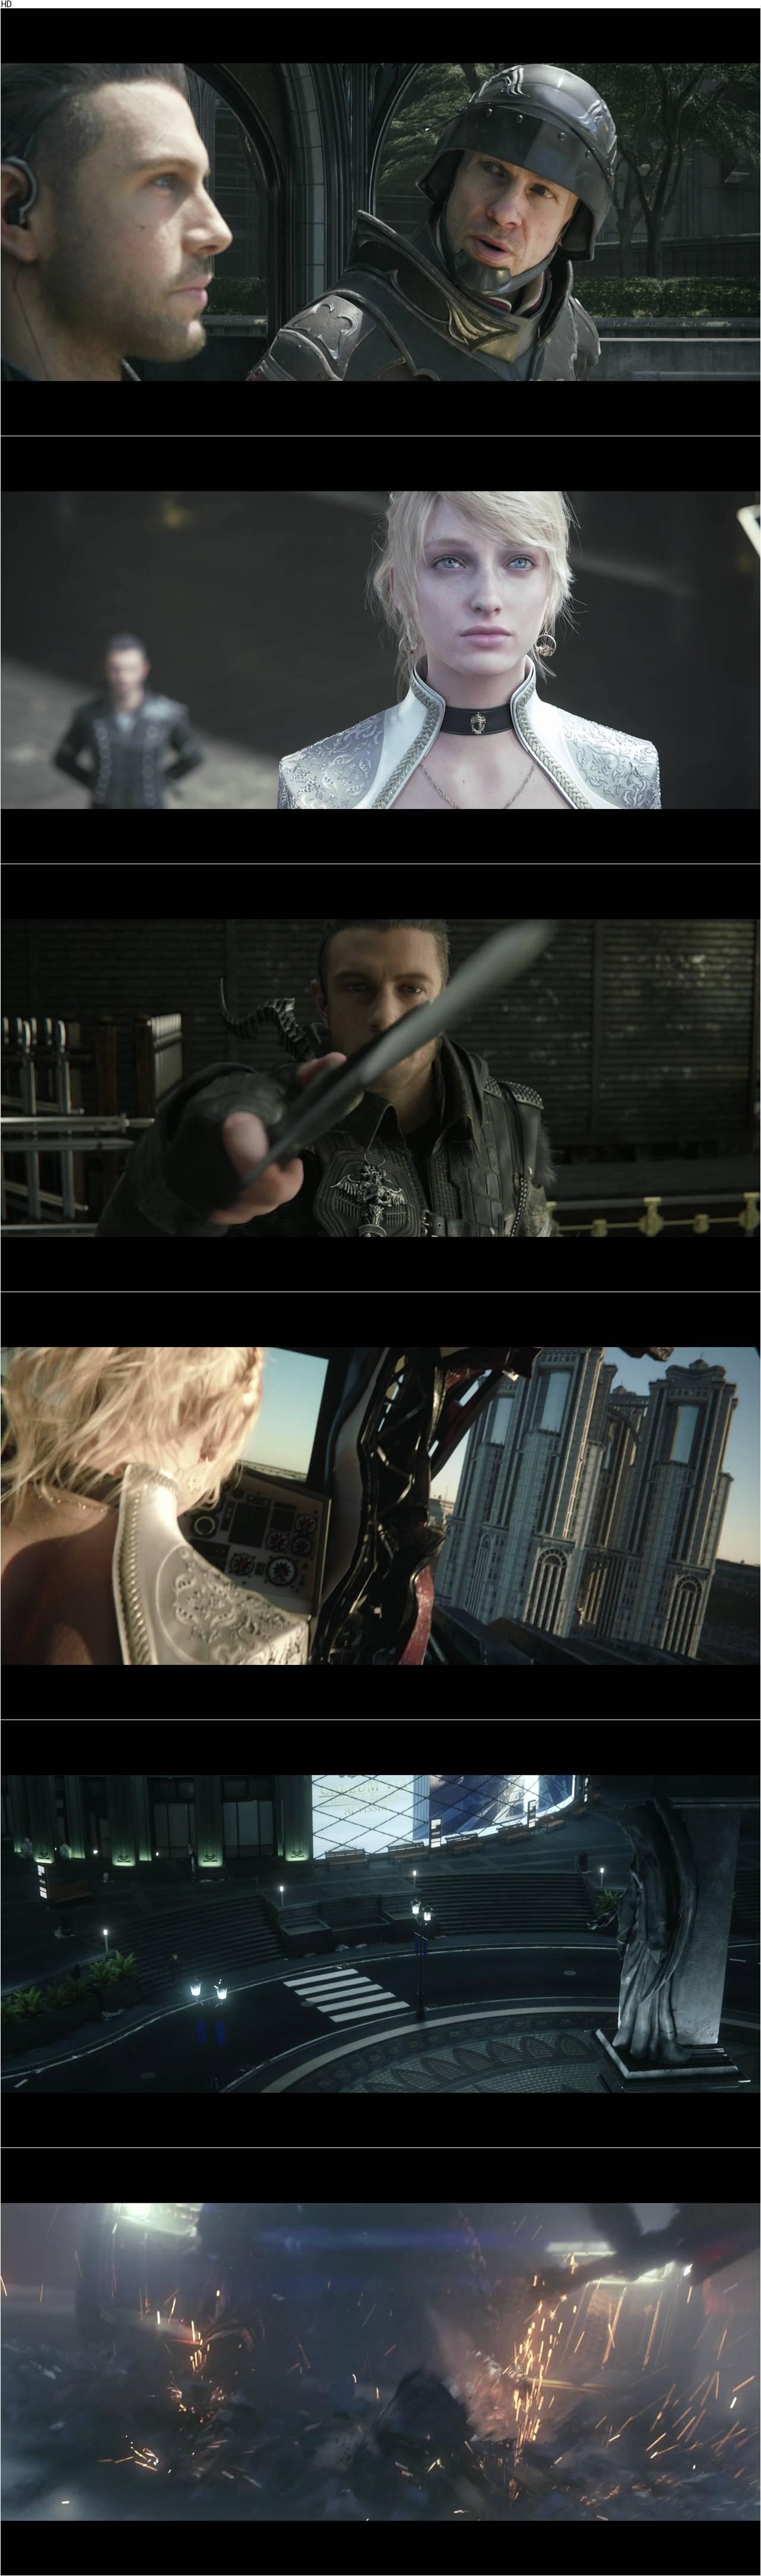 Kingsglaive Final Fantasy Xv 2016 Avaxhome